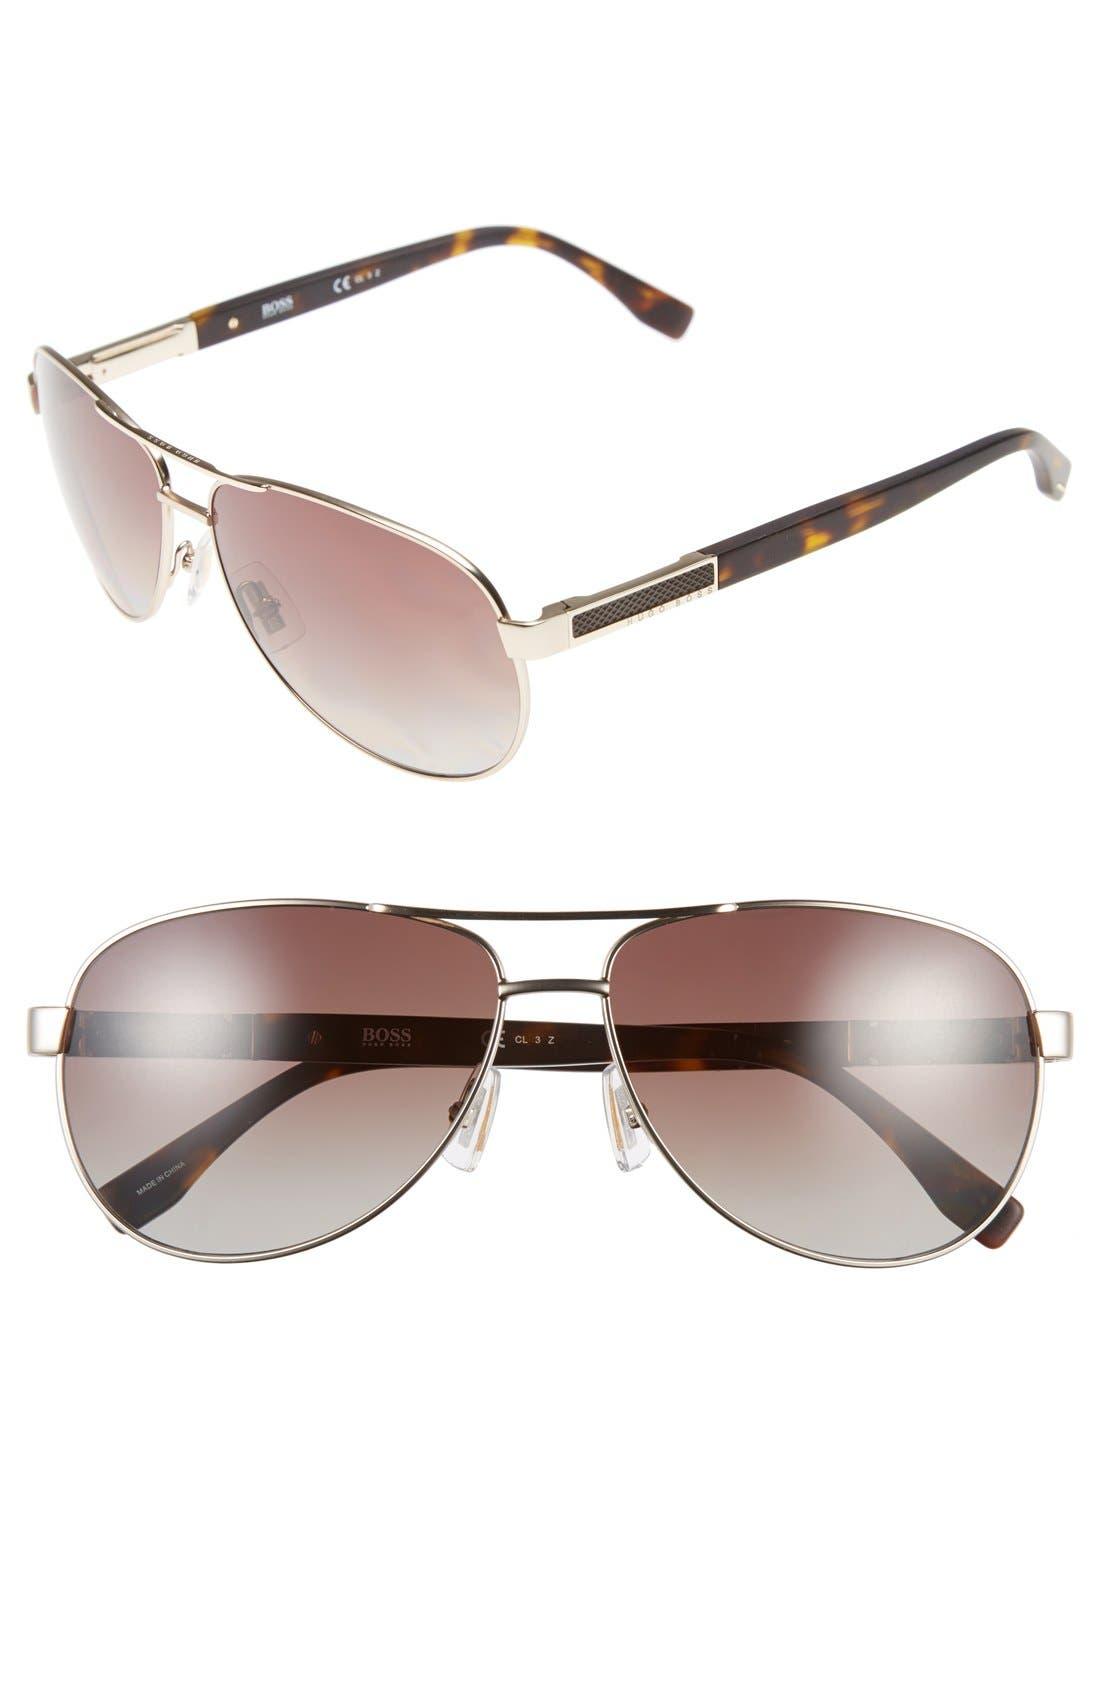 62mm Polarized Aviator Sunglasses,                             Main thumbnail 1, color,